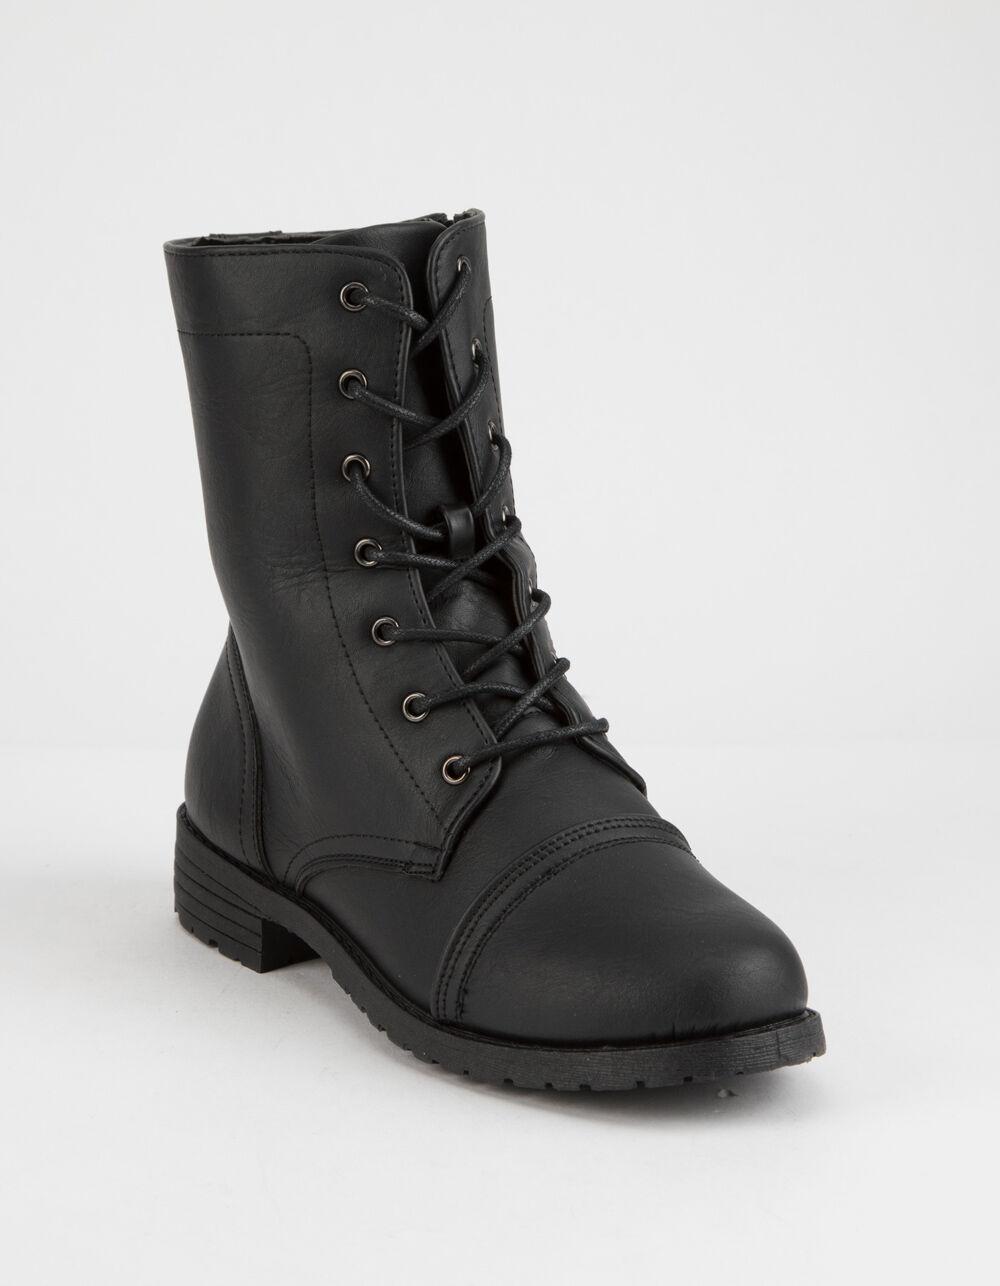 WILD DIVA Lace Up Black Combat Boots